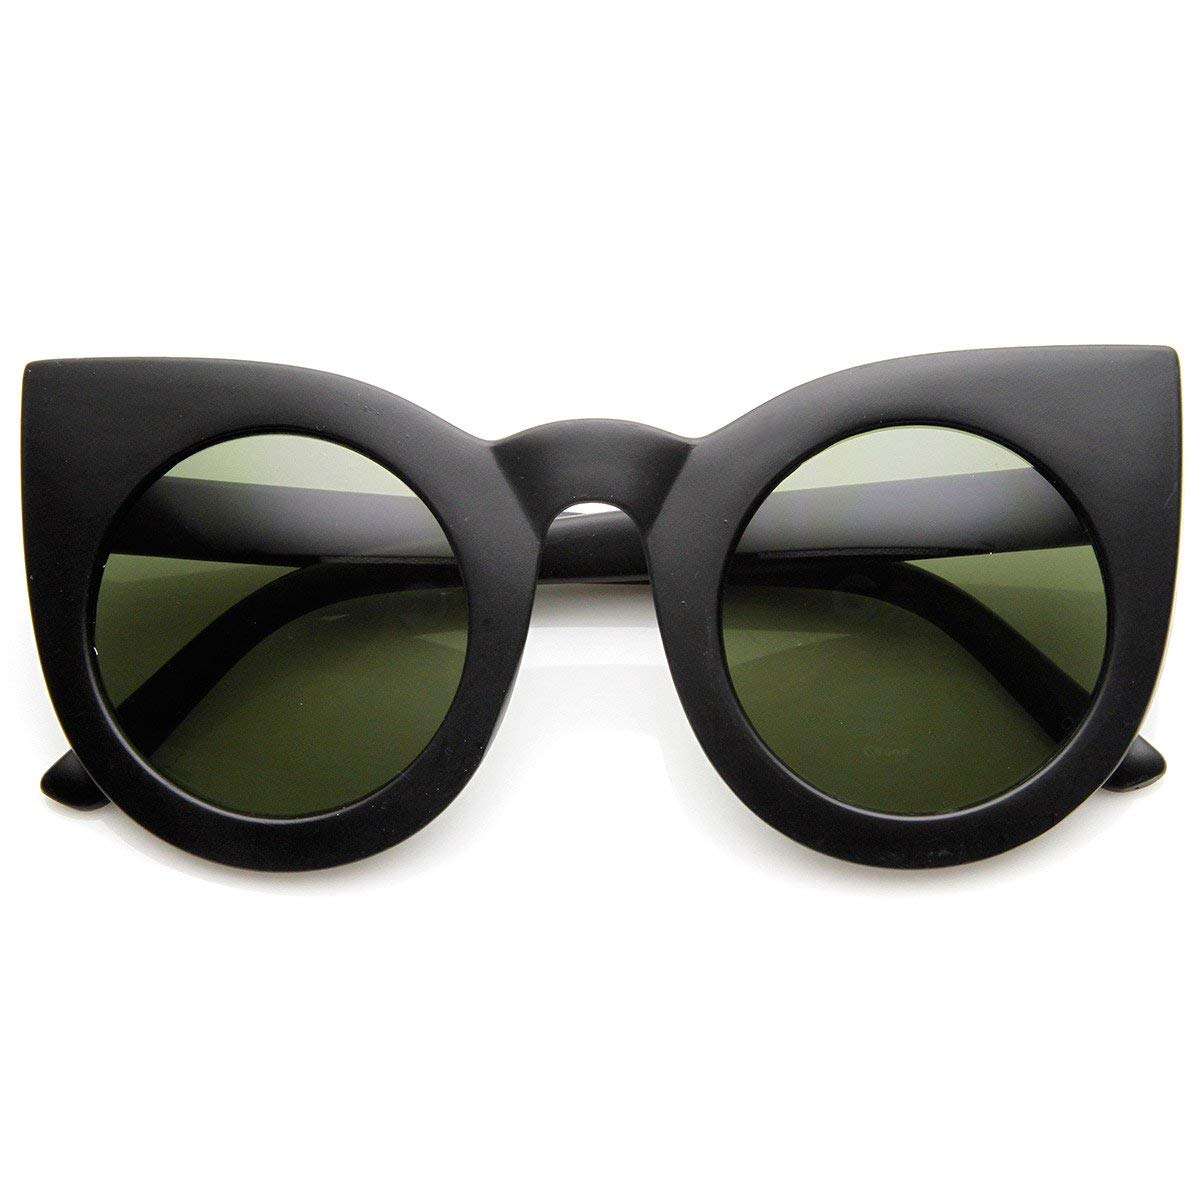 7d76b12b6066 Amazon.com  zeroUV - 70s Womens Large Oversized Retro Vintage Cat Eye  Sunglasses For Women with Round Lens 48mm (Matte Black Gree)  Clothing